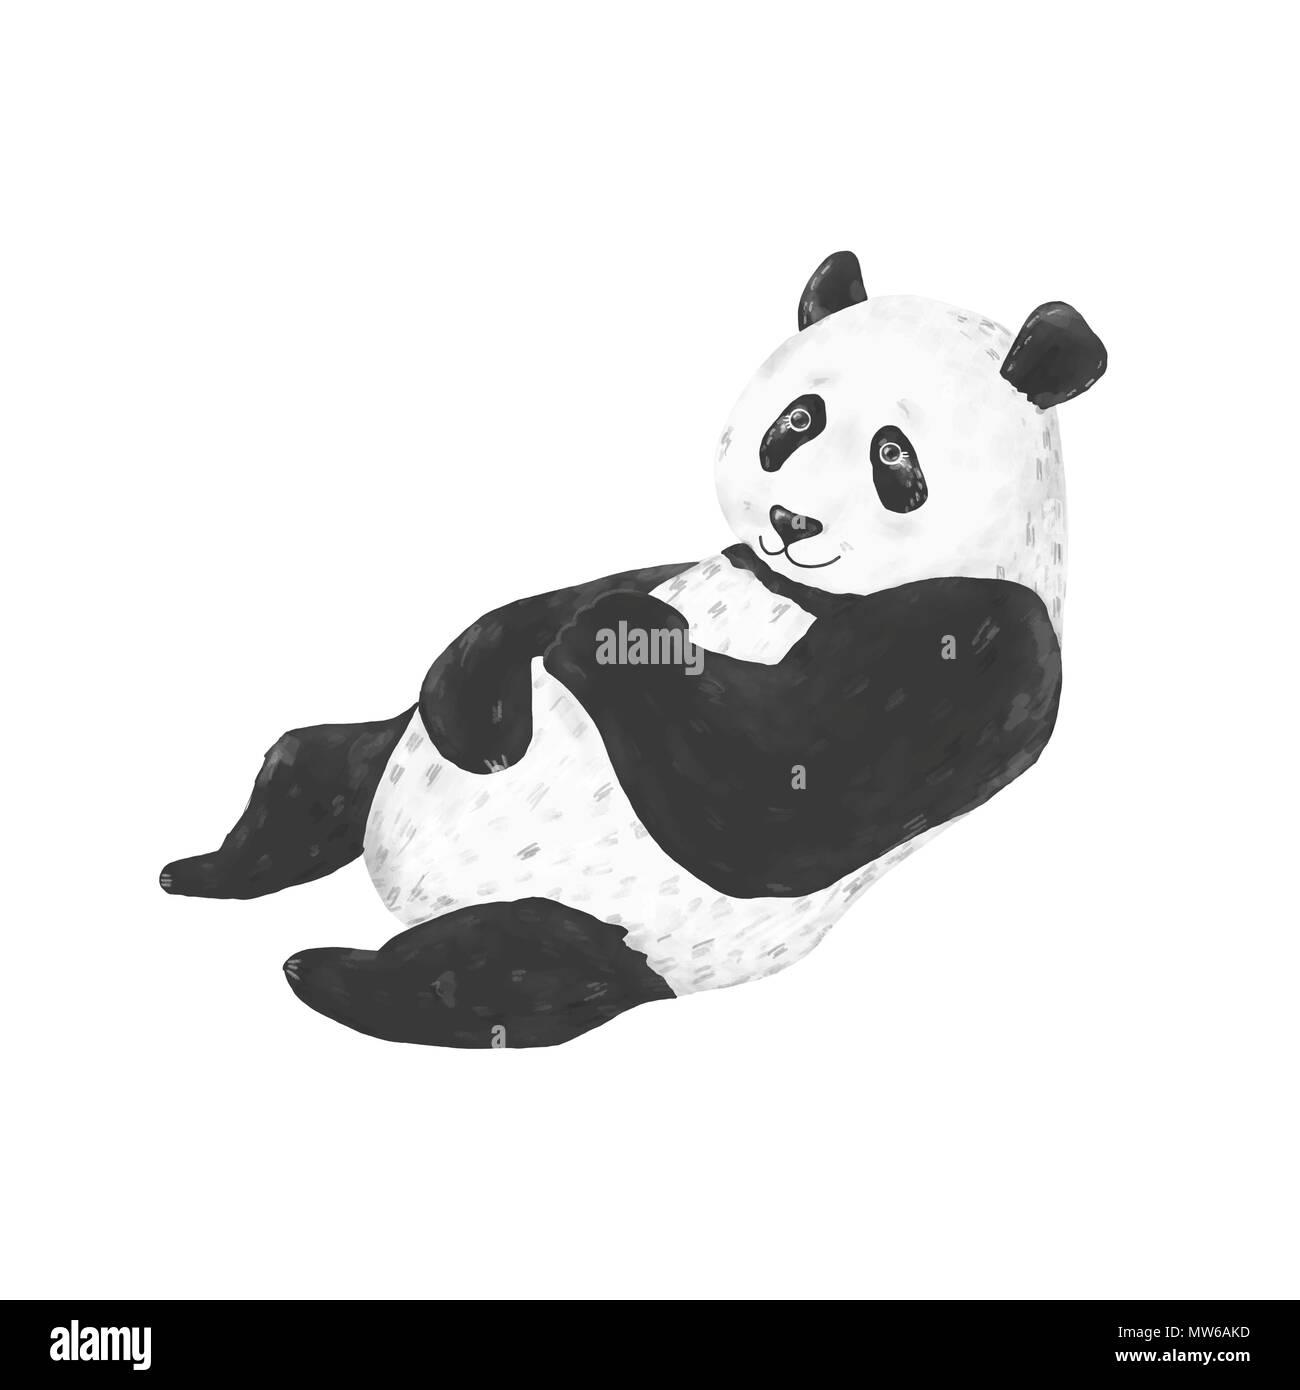 Panda Clip Art Drawing Animal Funny Character On White Bakcground Stock Photo Alamy